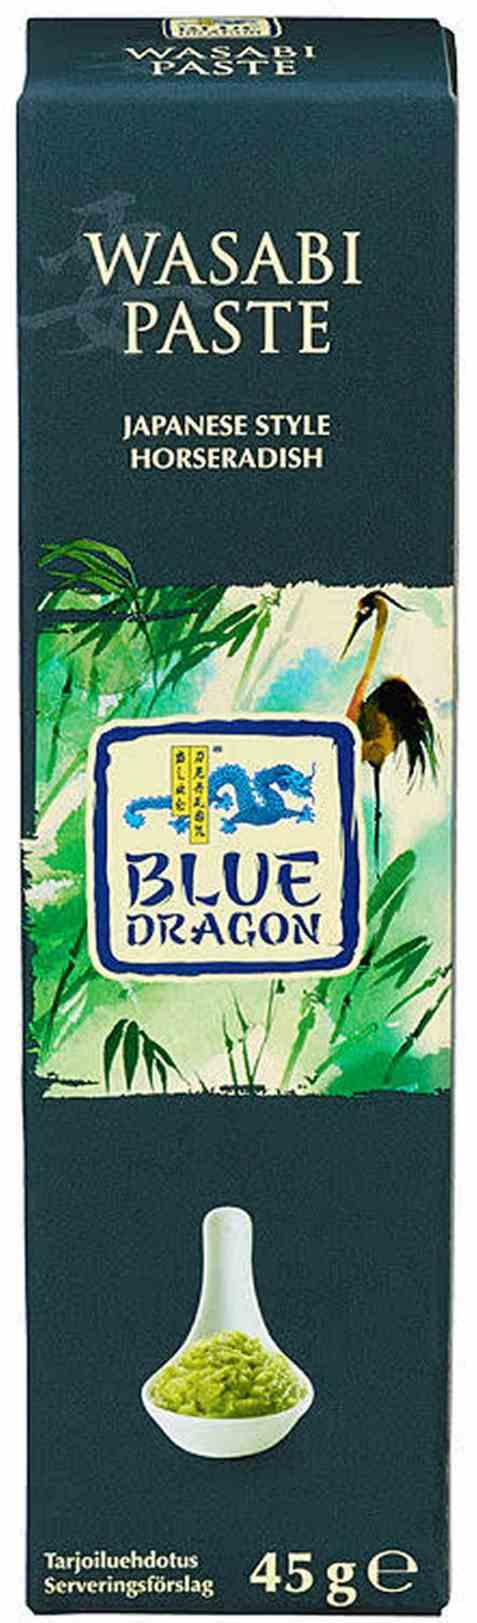 Bilde av Blue Dragon Wasabipaste.